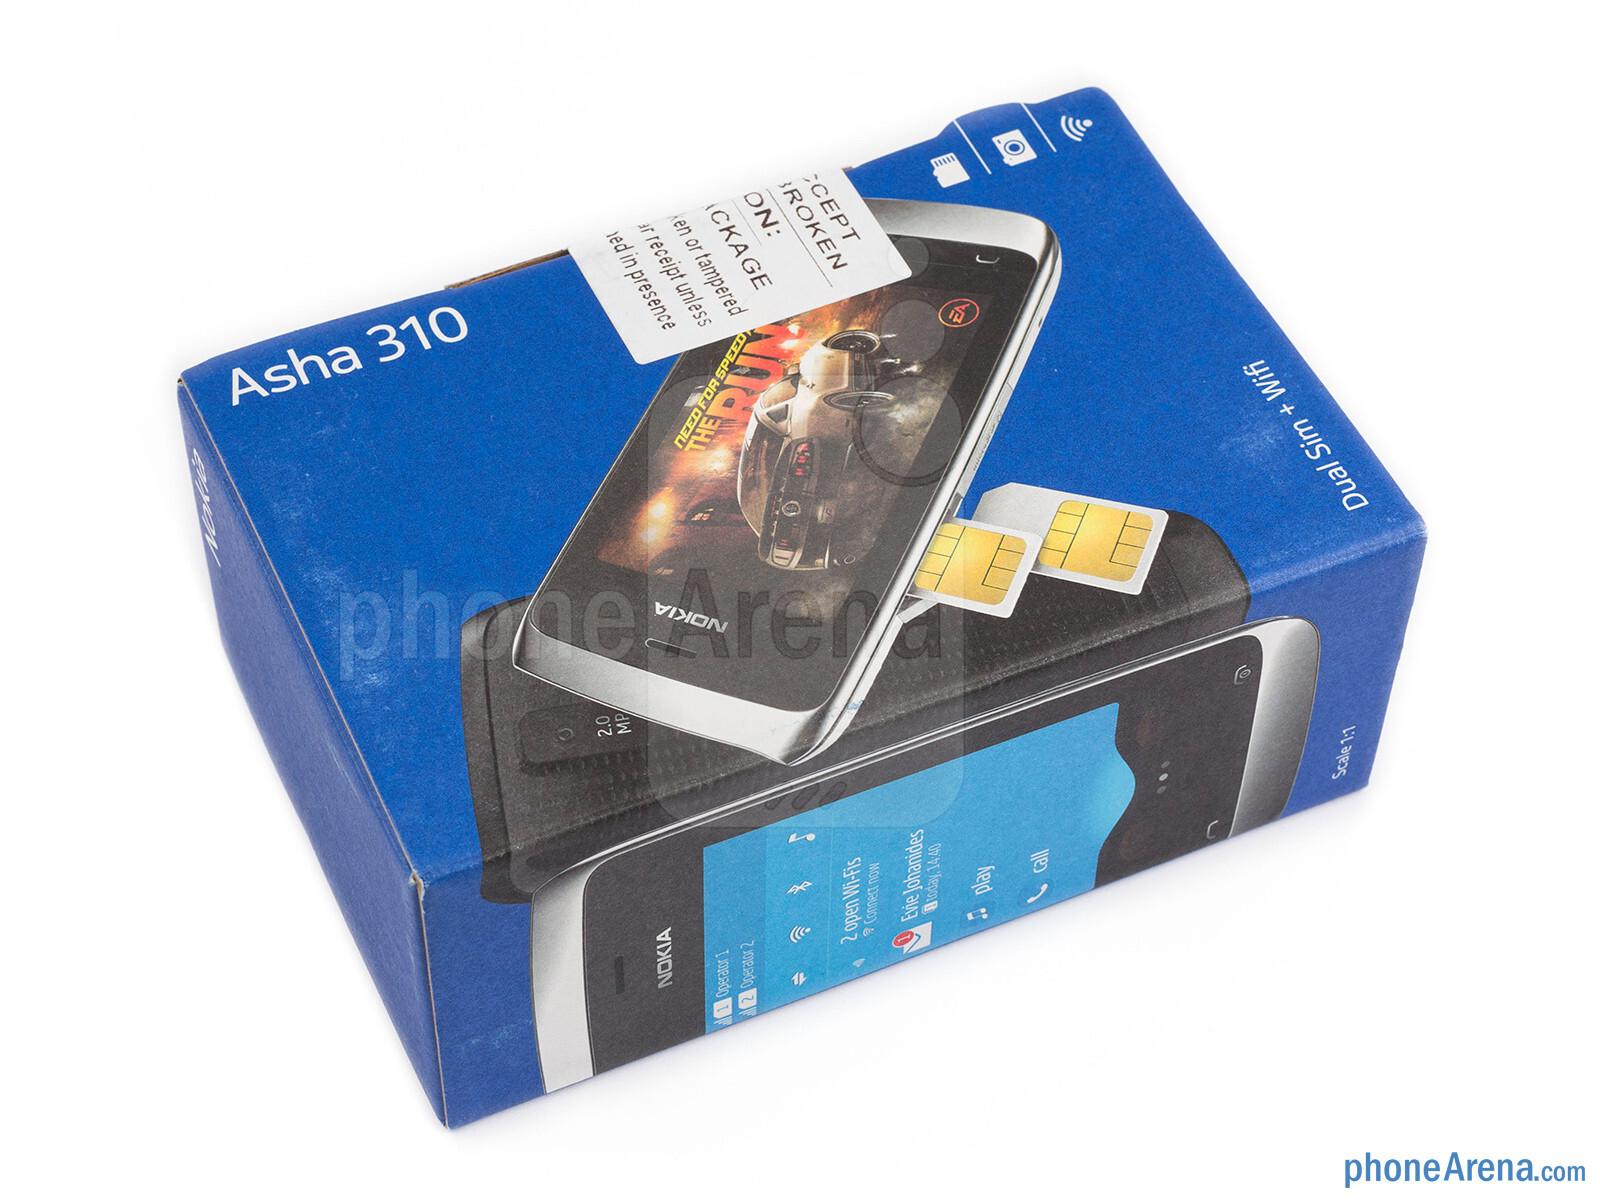 Nokia Asha 310 Review - PhoneArena